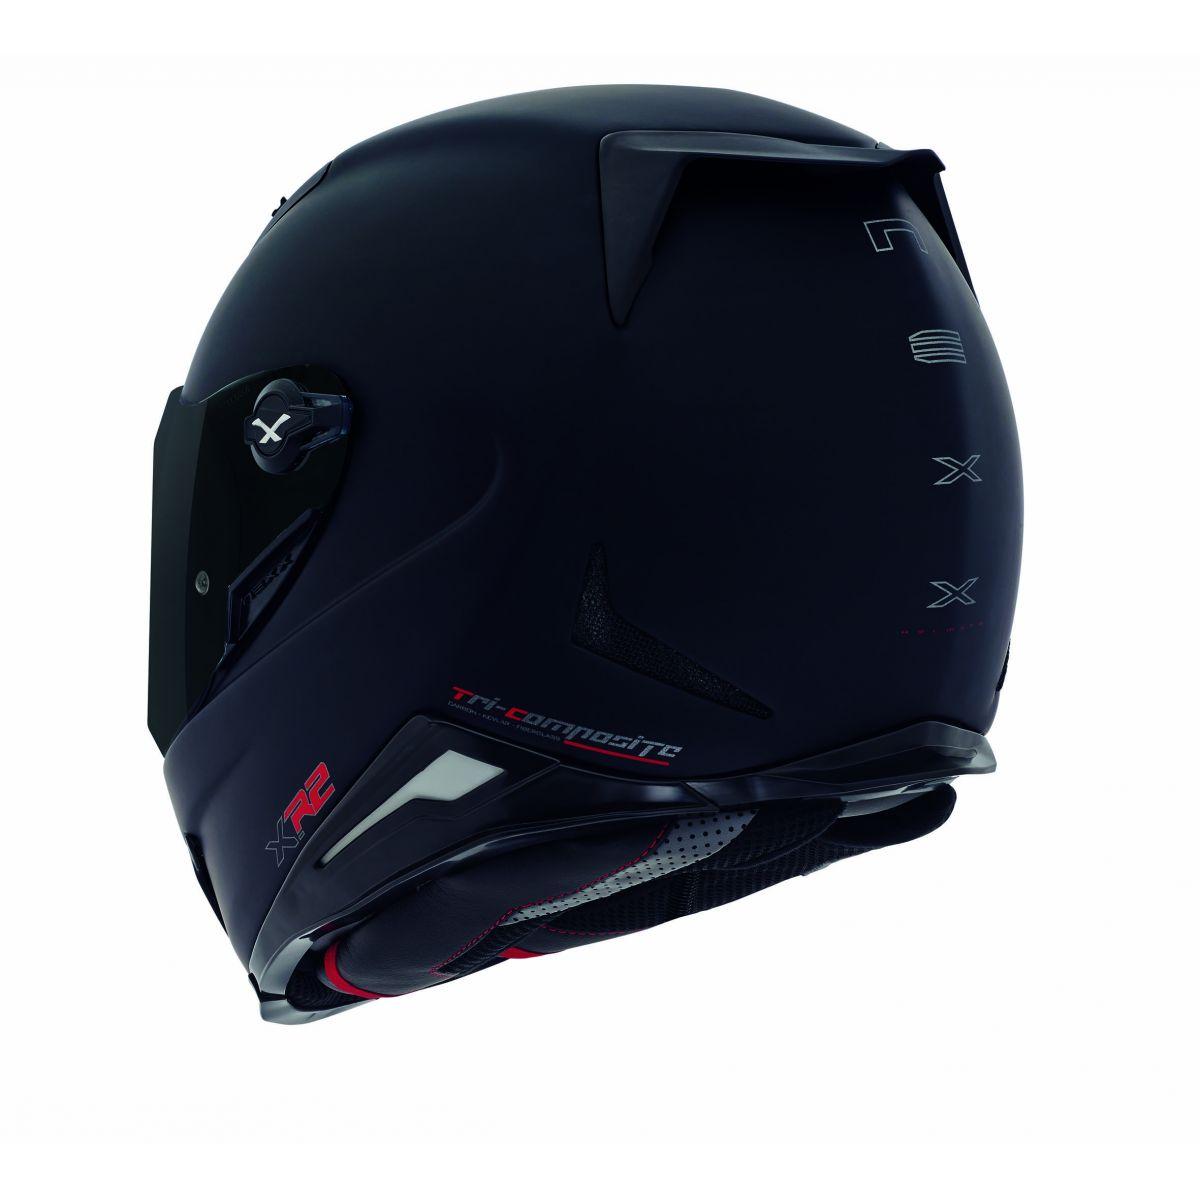 Capacete Nexx XR2 Plain Preto Brilhante Tri-Composto - Só 62 e 64  - Nova Centro Boutique Roupas para Motociclistas